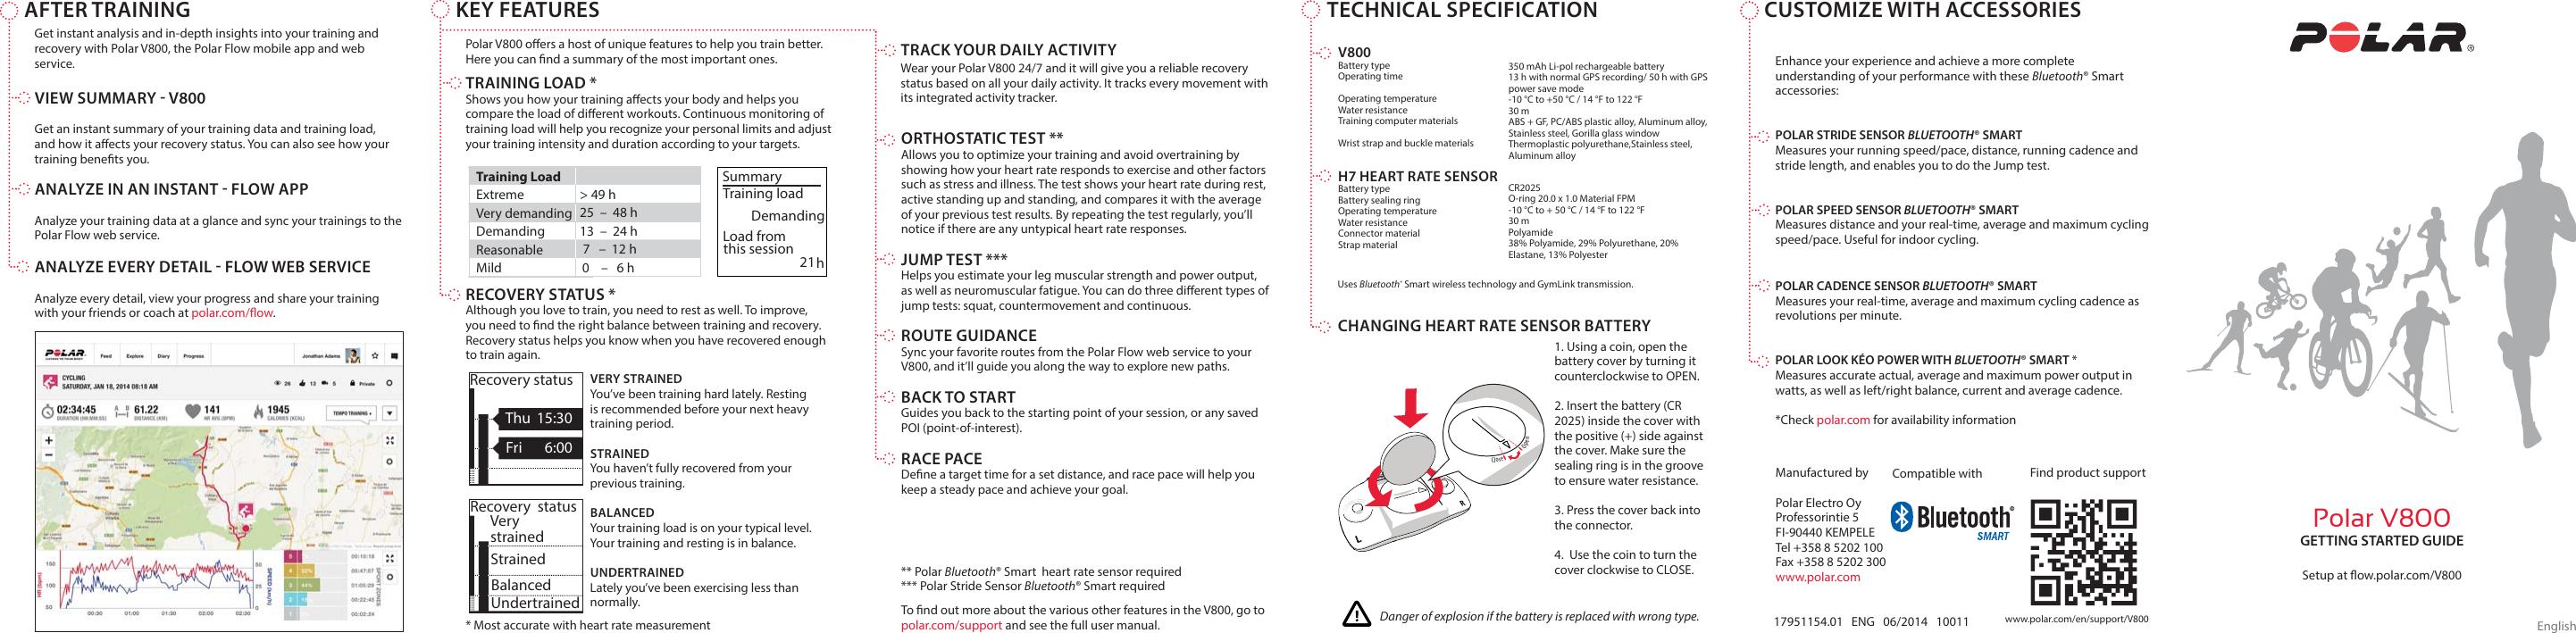 Polar V800 Getting Started Guide V800_GSG_UPDATE_EN